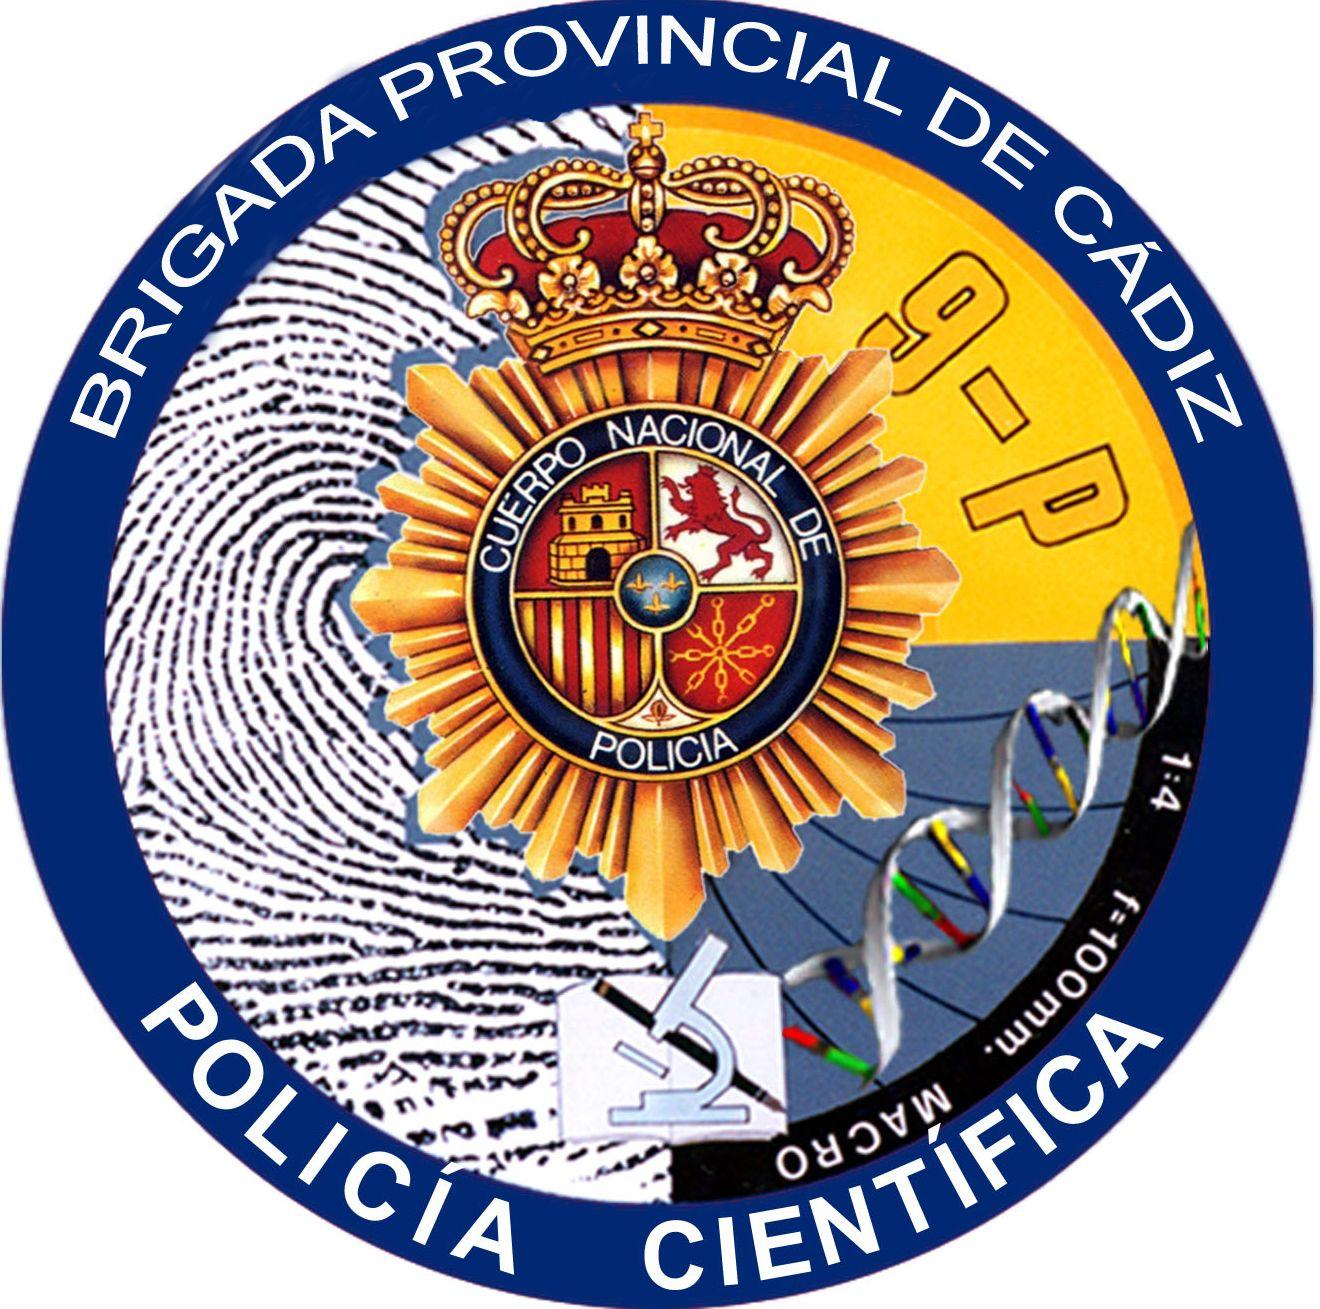 Polic a cient fica de la comisar a provincial de c diz - Policia nacional cadiz ...